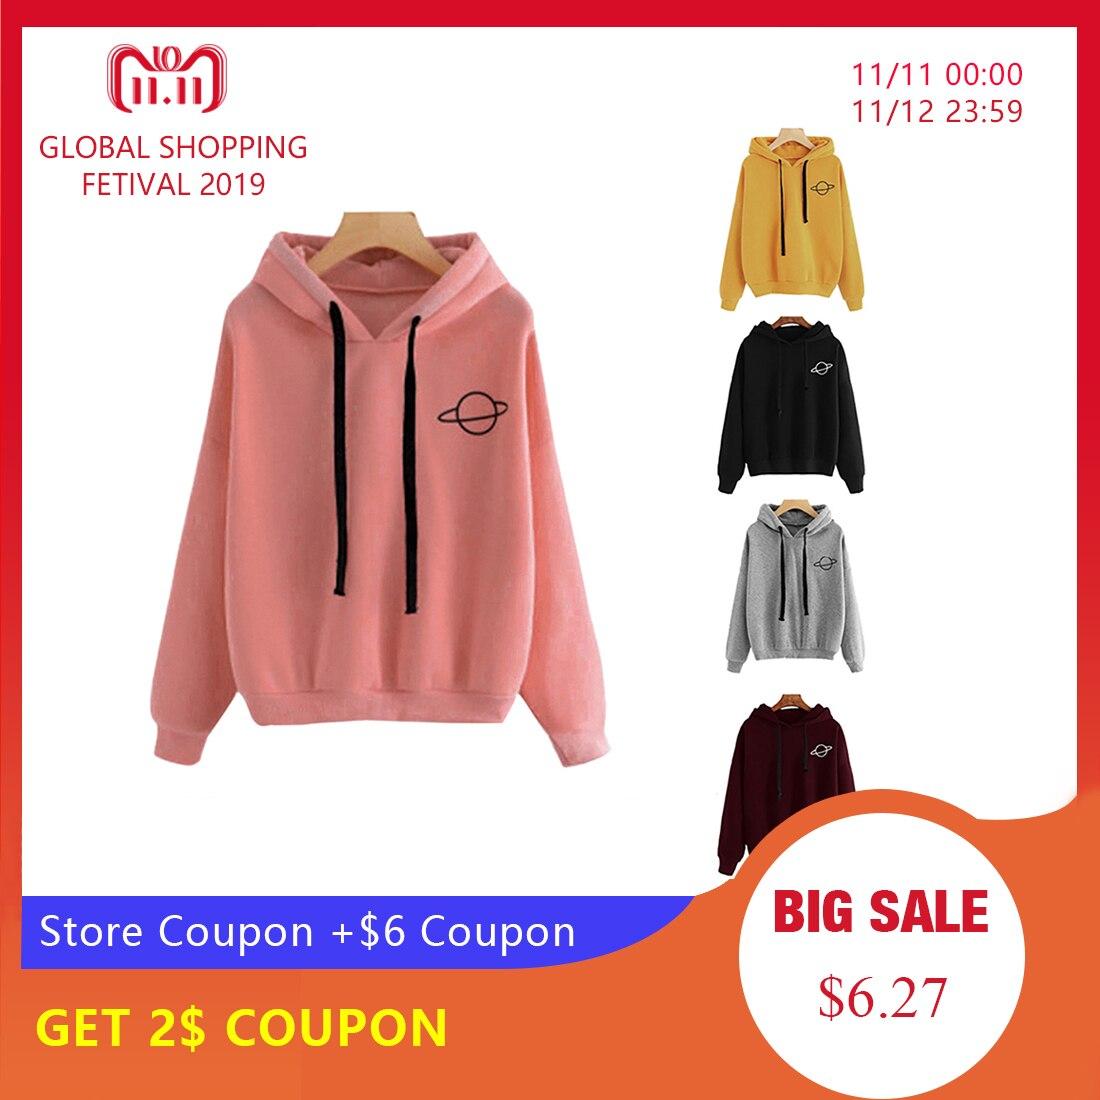 WENYUJH Women Hoodies Casual Kpop Planet Print Solid Loose Drawstring Sweatshirt Long Sleeve Hooded 2019 Autumn Female Pullover